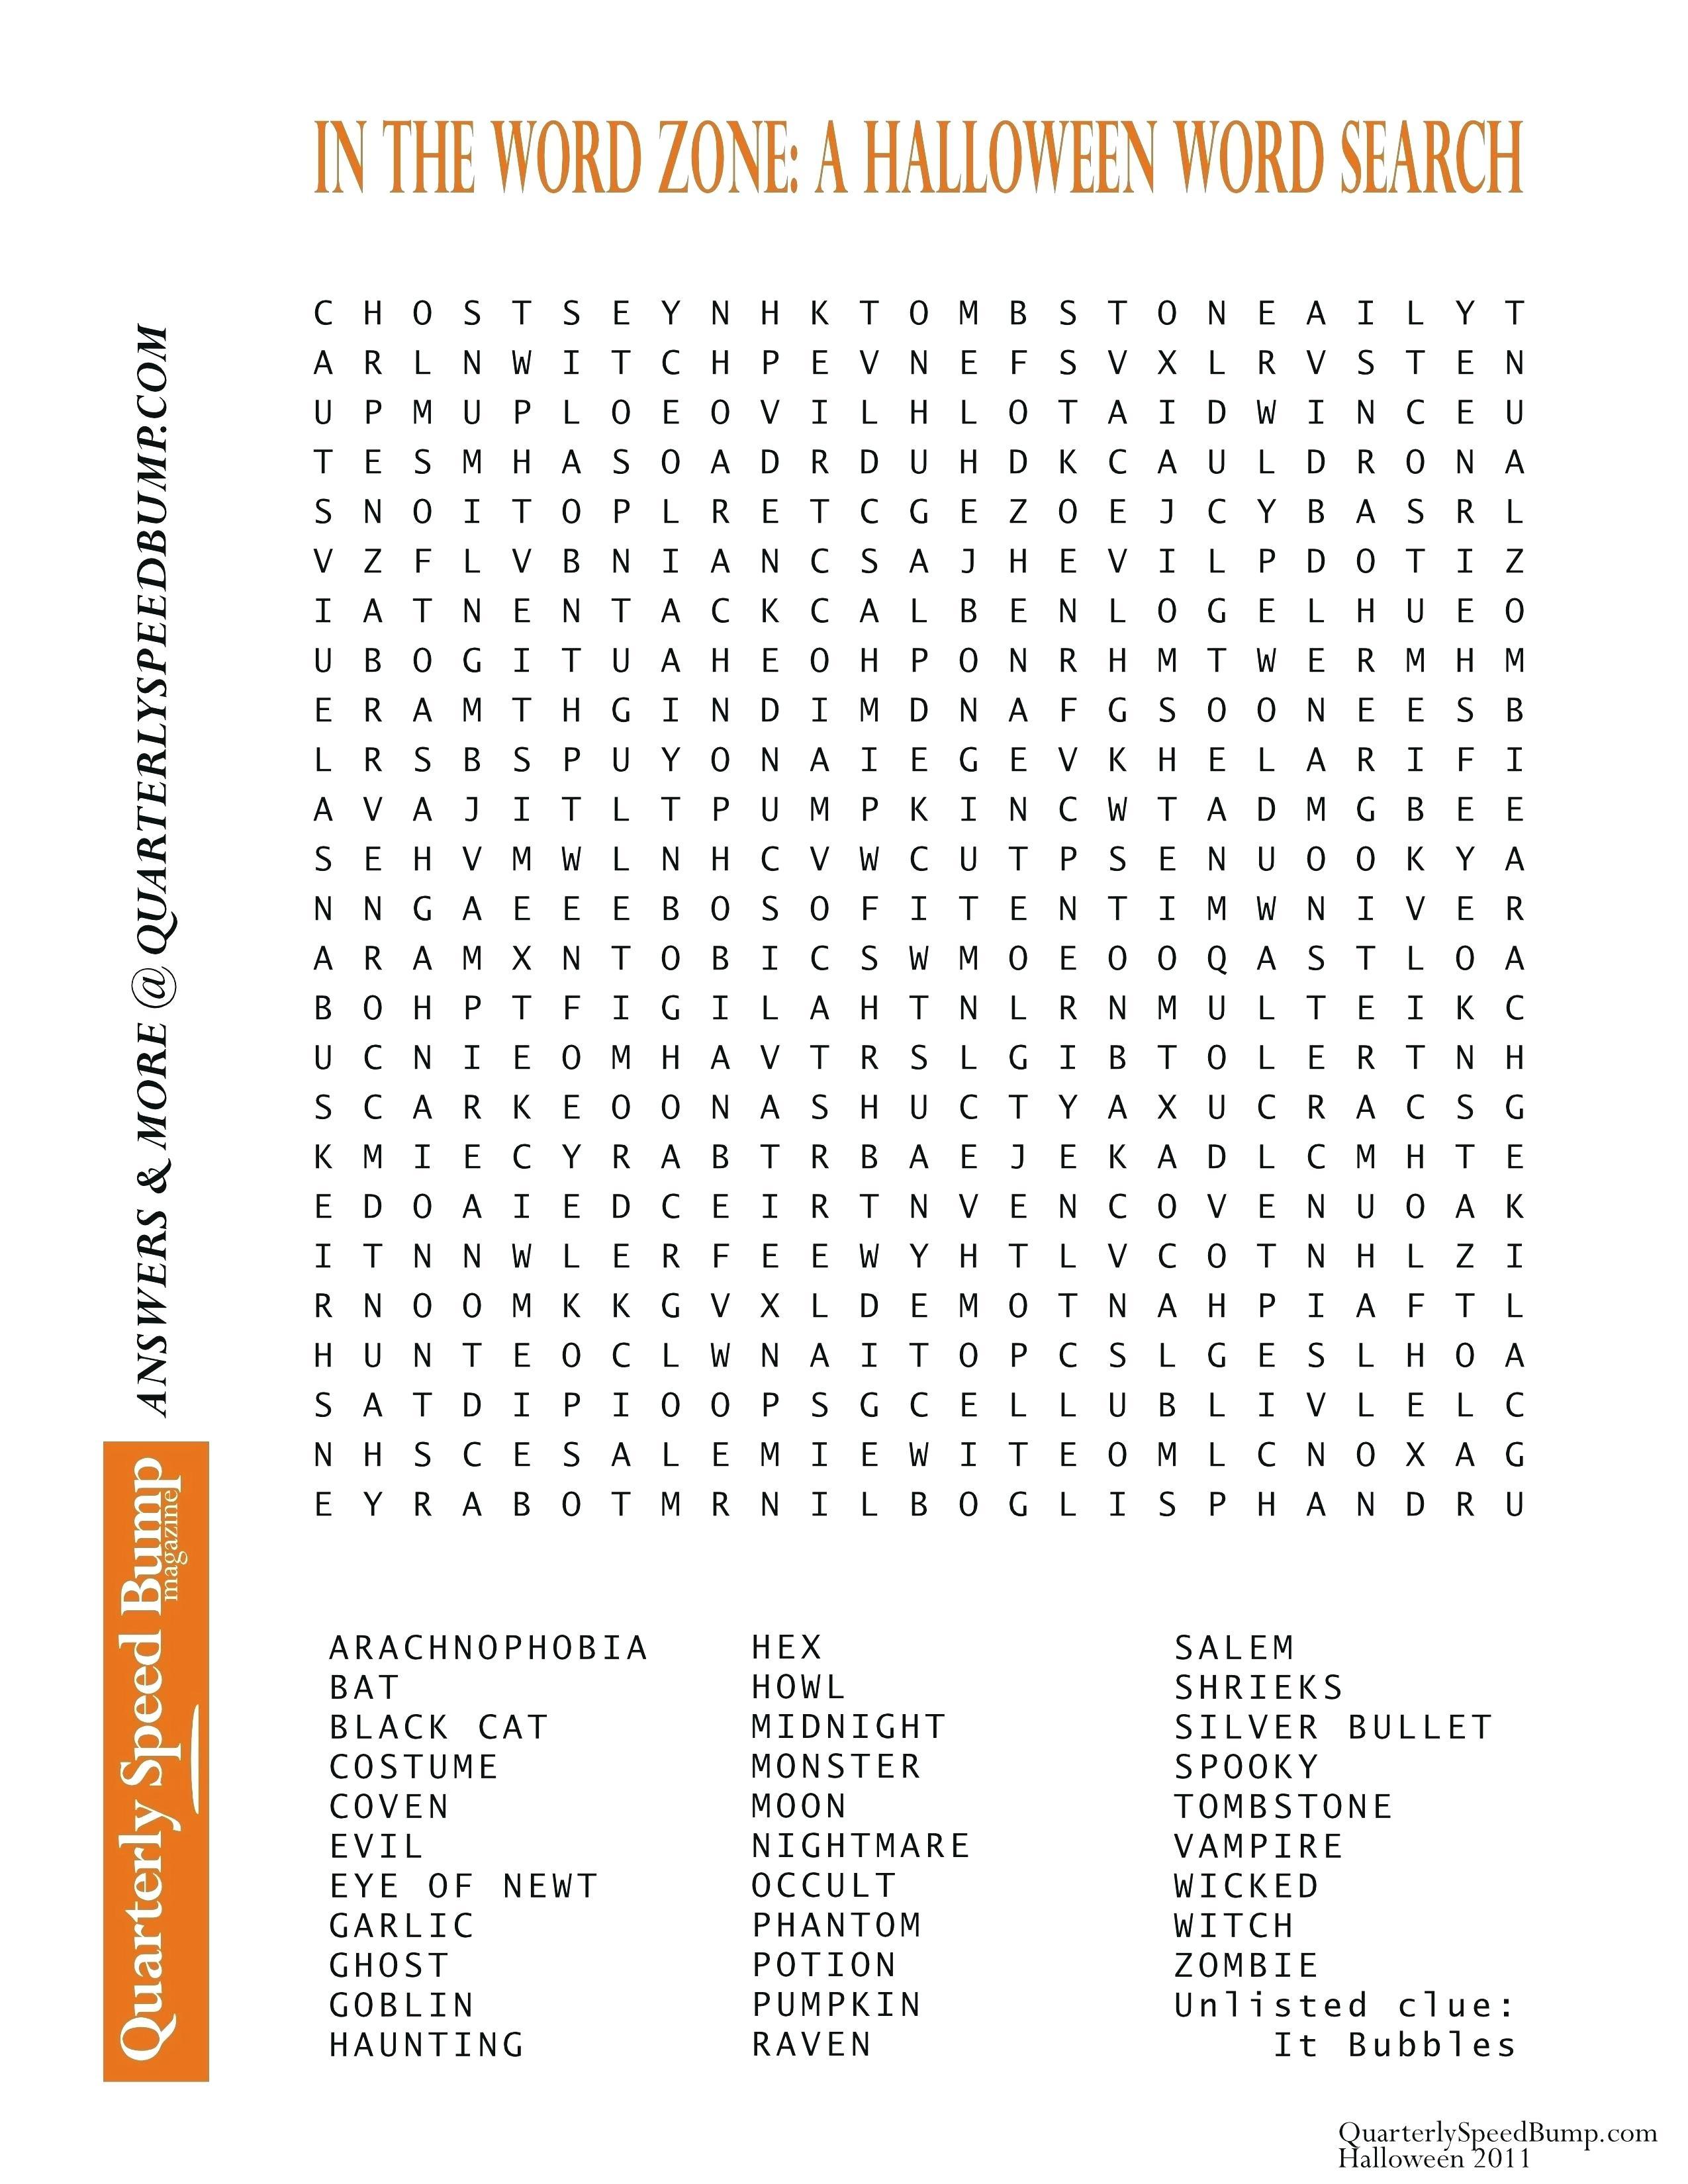 Word Search Printables Hard Hard Printable Word Search Puzzles For - Free Printable Word Search Puzzles For Adults